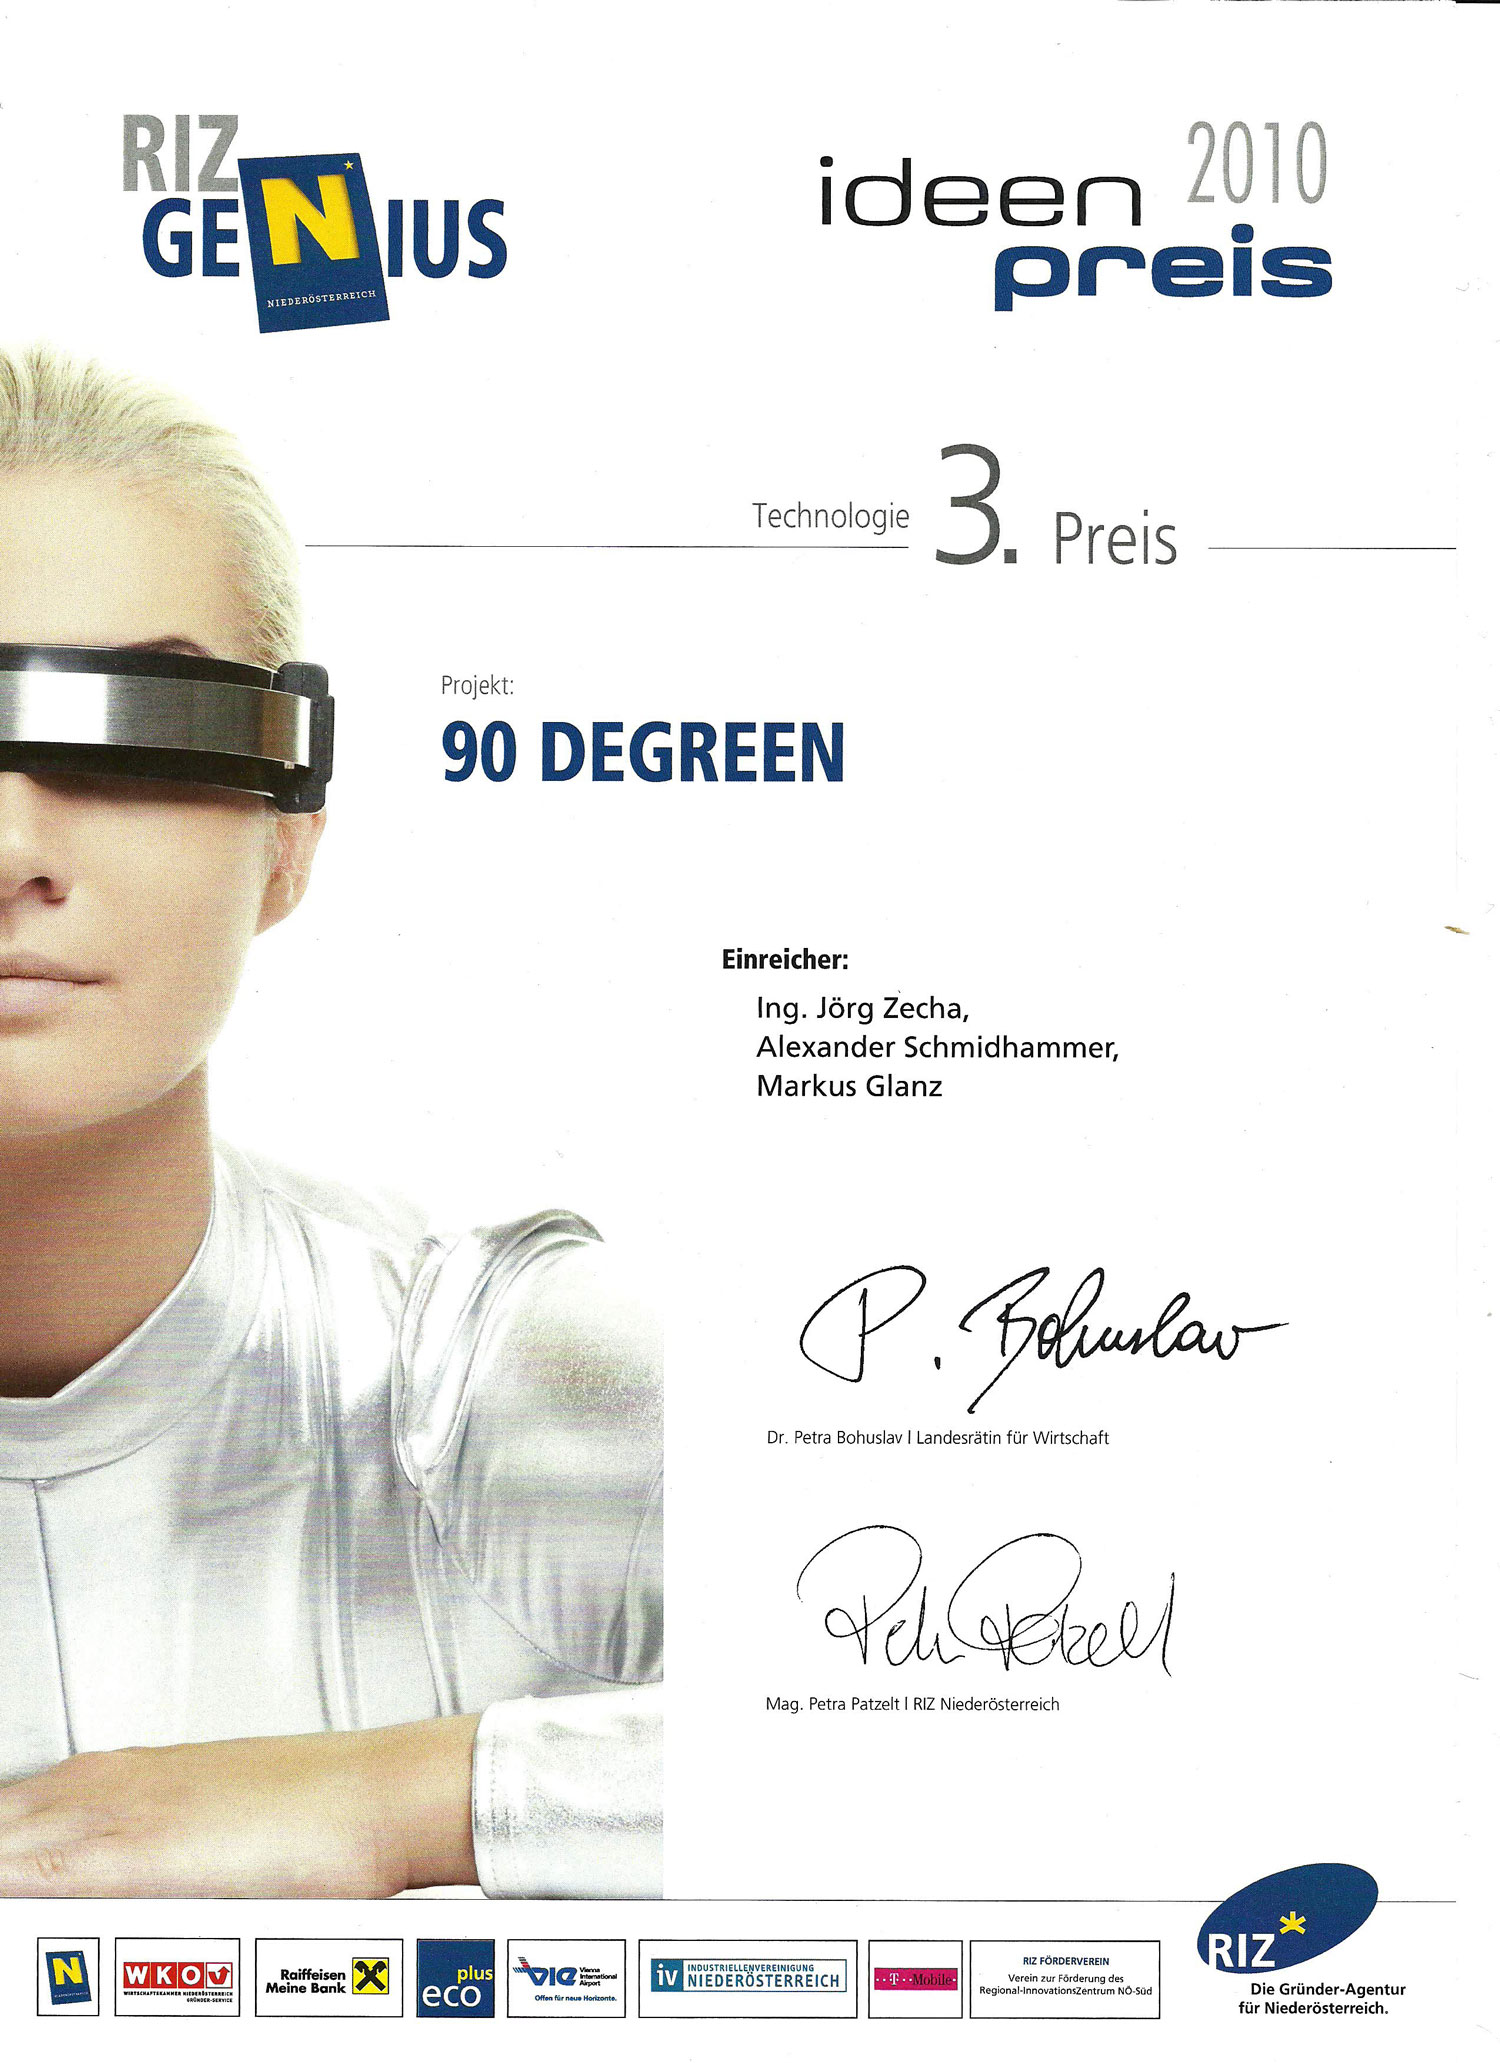 Geniuspreis-2010